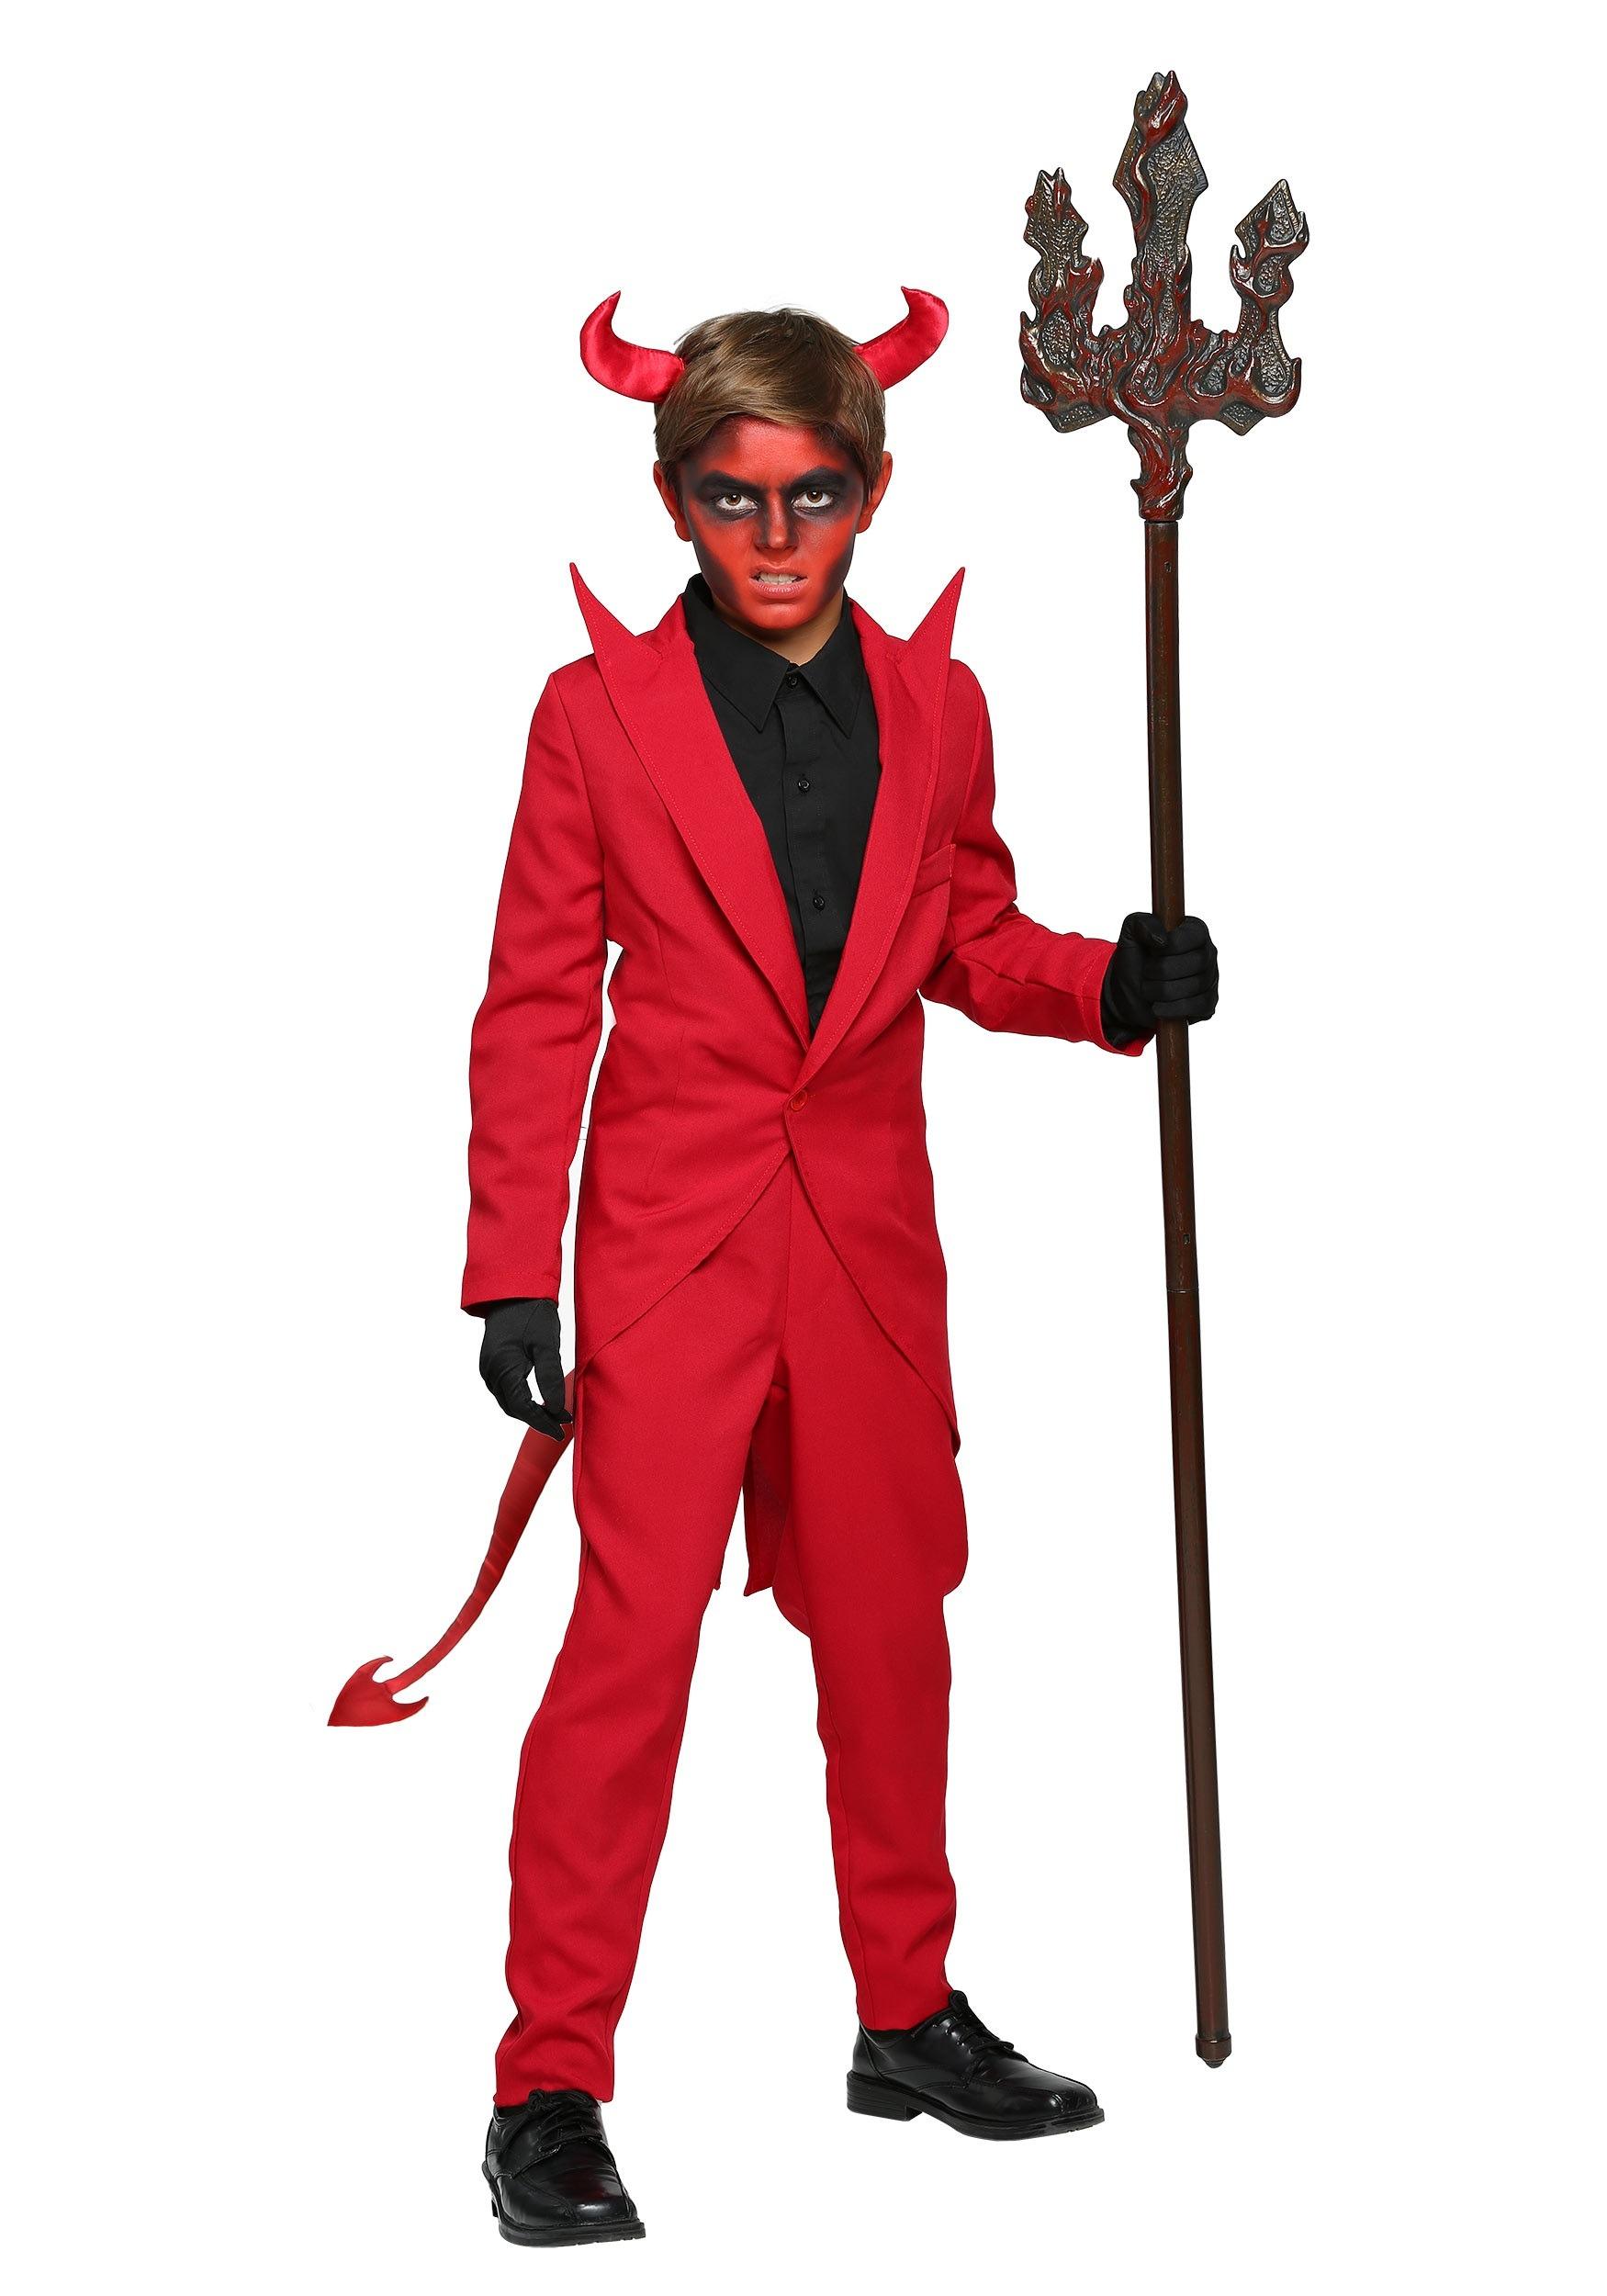 red devil suit costume for kids